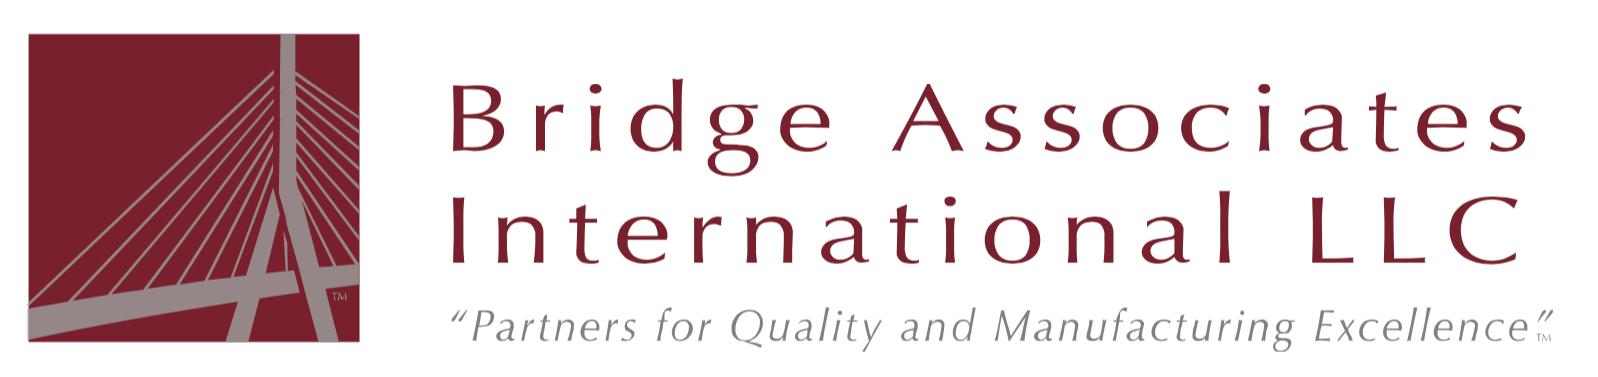 Bridge Associates International